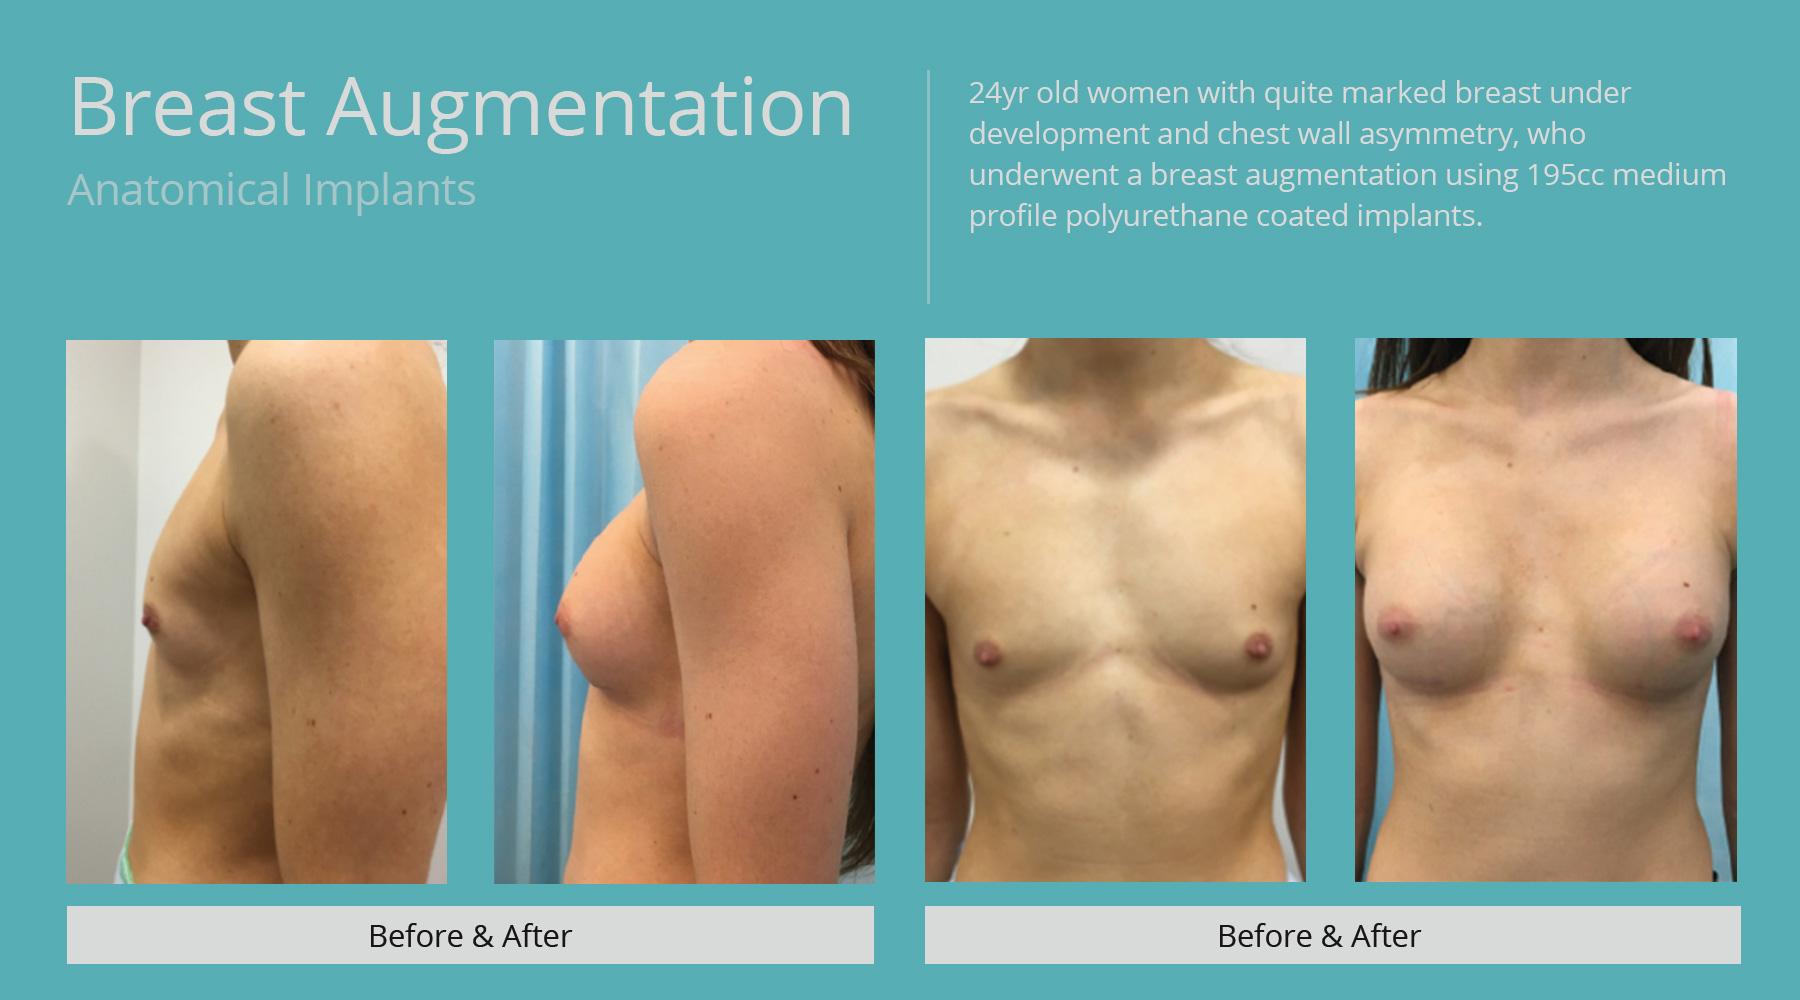 Breast-Augmentation-anatomical-2